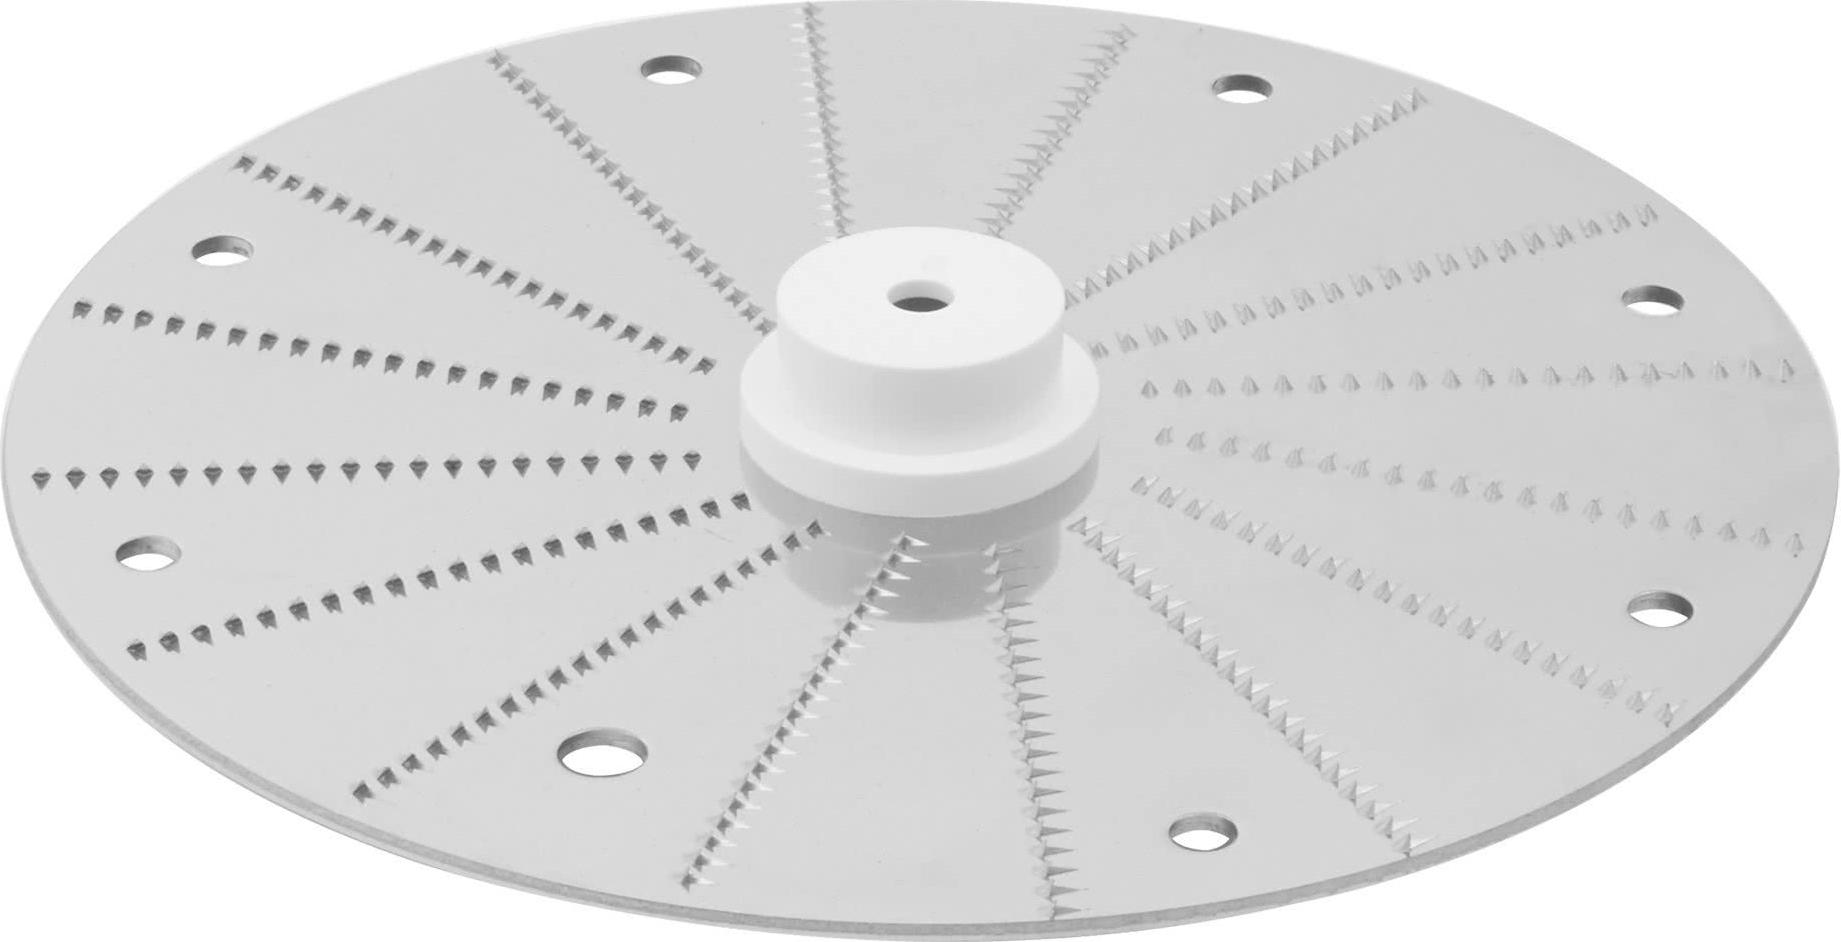 Диск-тёрка Robot Coupe 27130(1,3мм) для редьки и хрена - 2